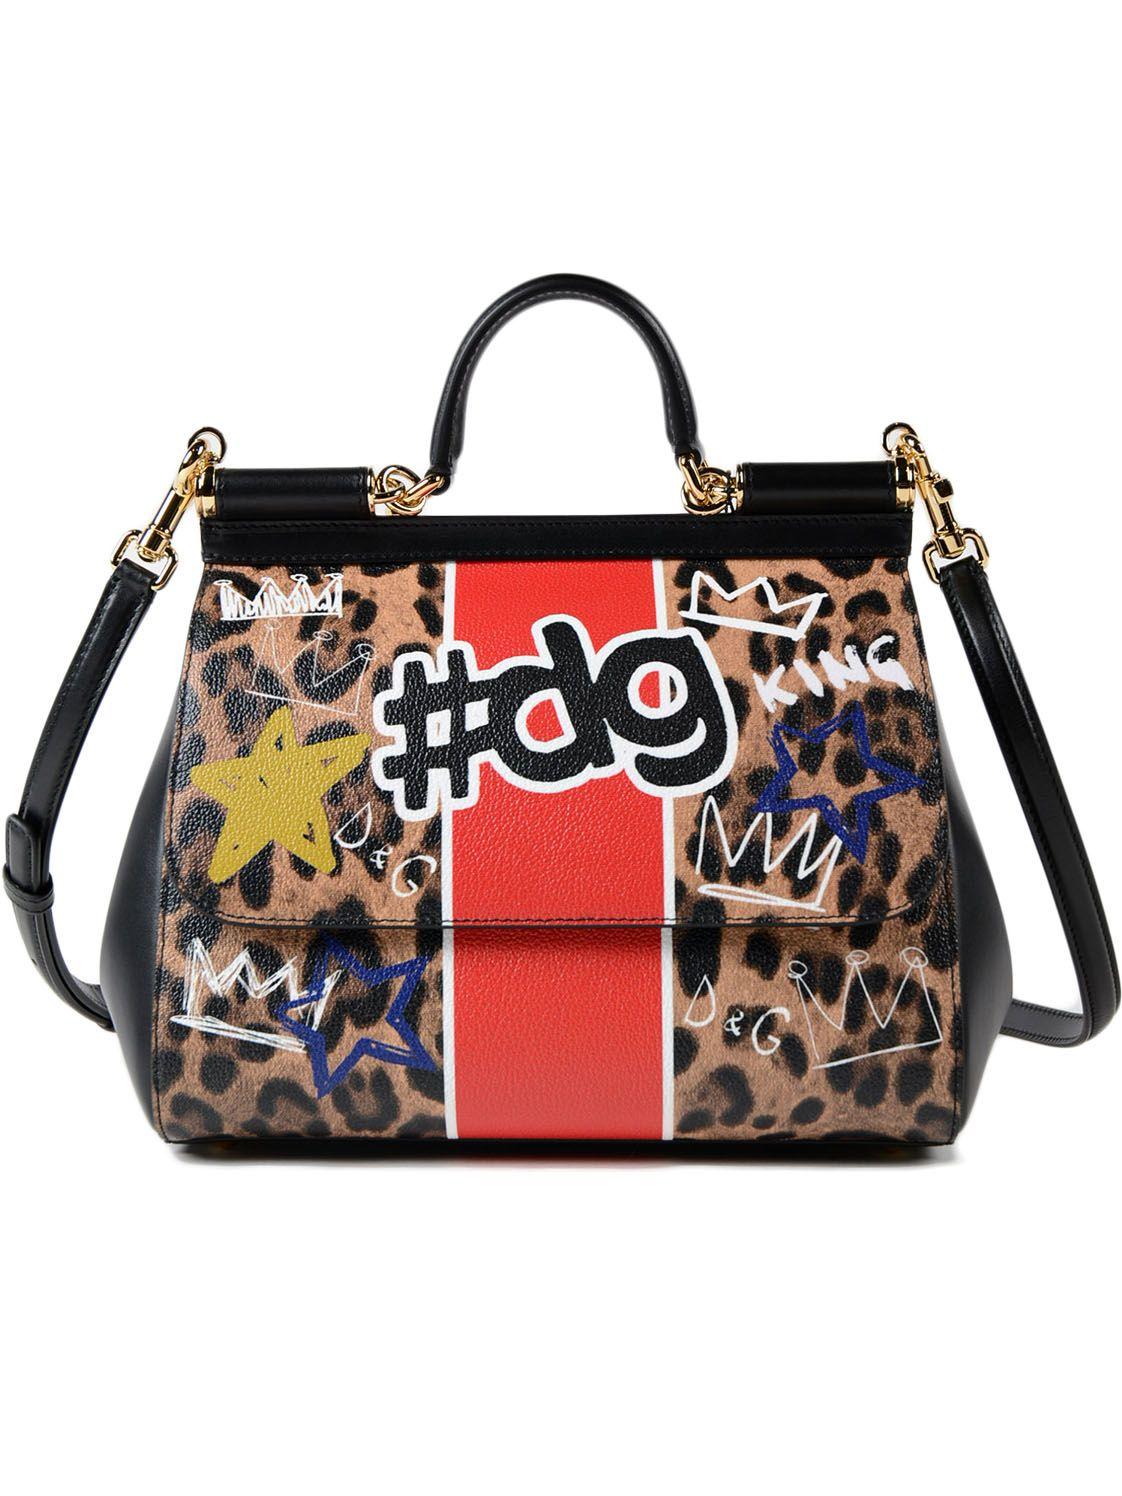 Dolce & Gabbana Printed Crespo Handbag